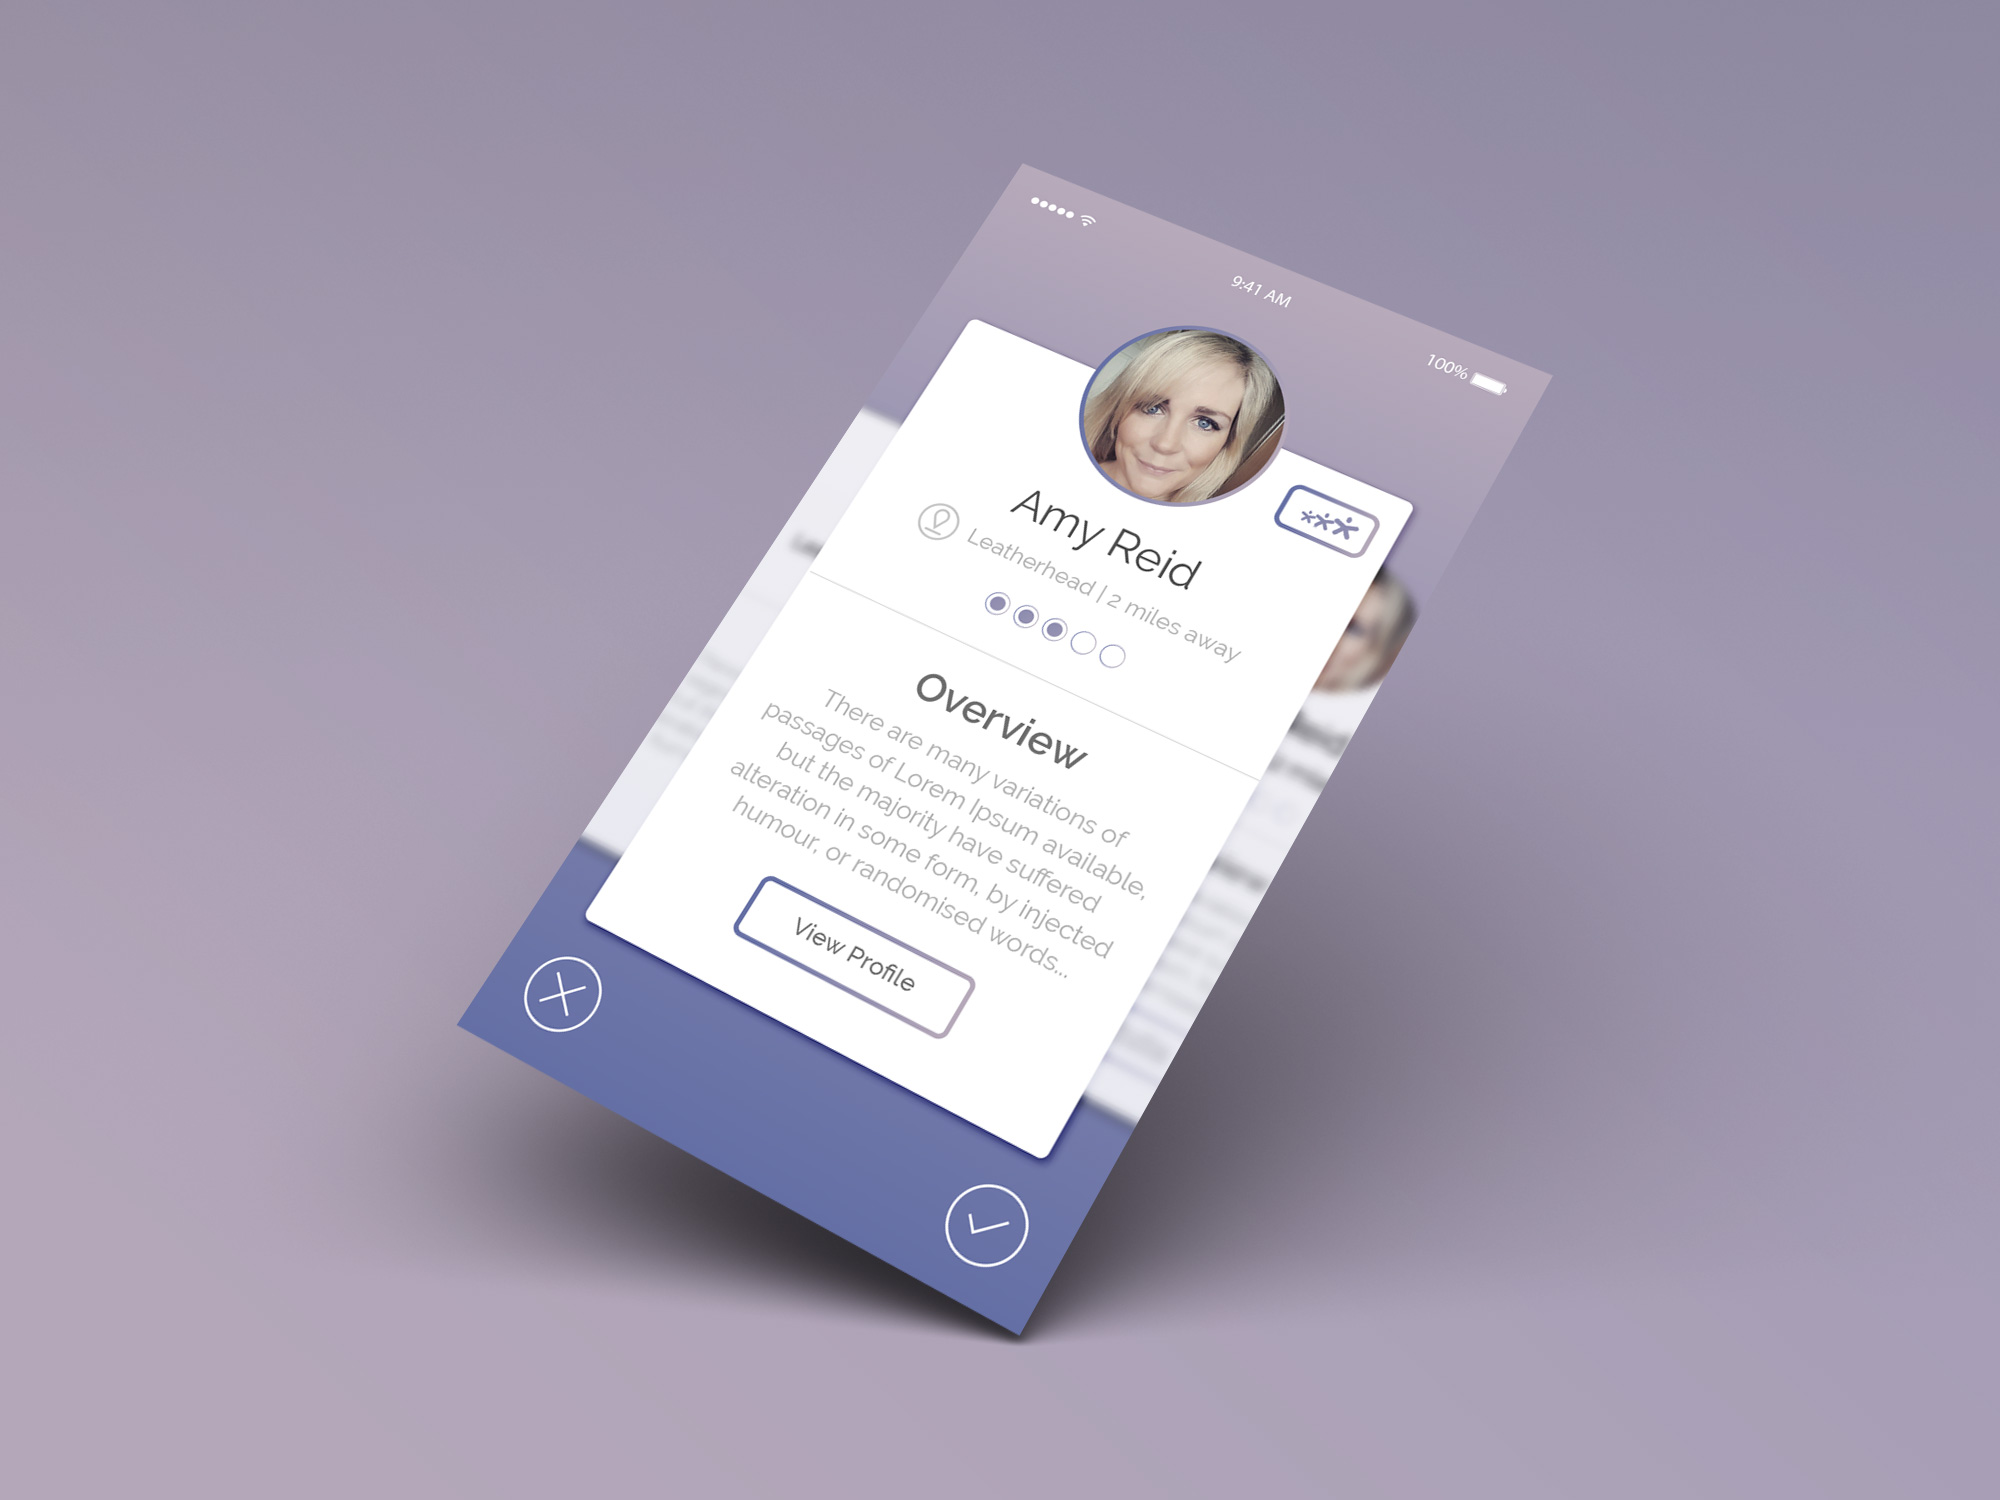 NanniFinder Nanni Profile Card View Joao Ferreira Freelance Designer